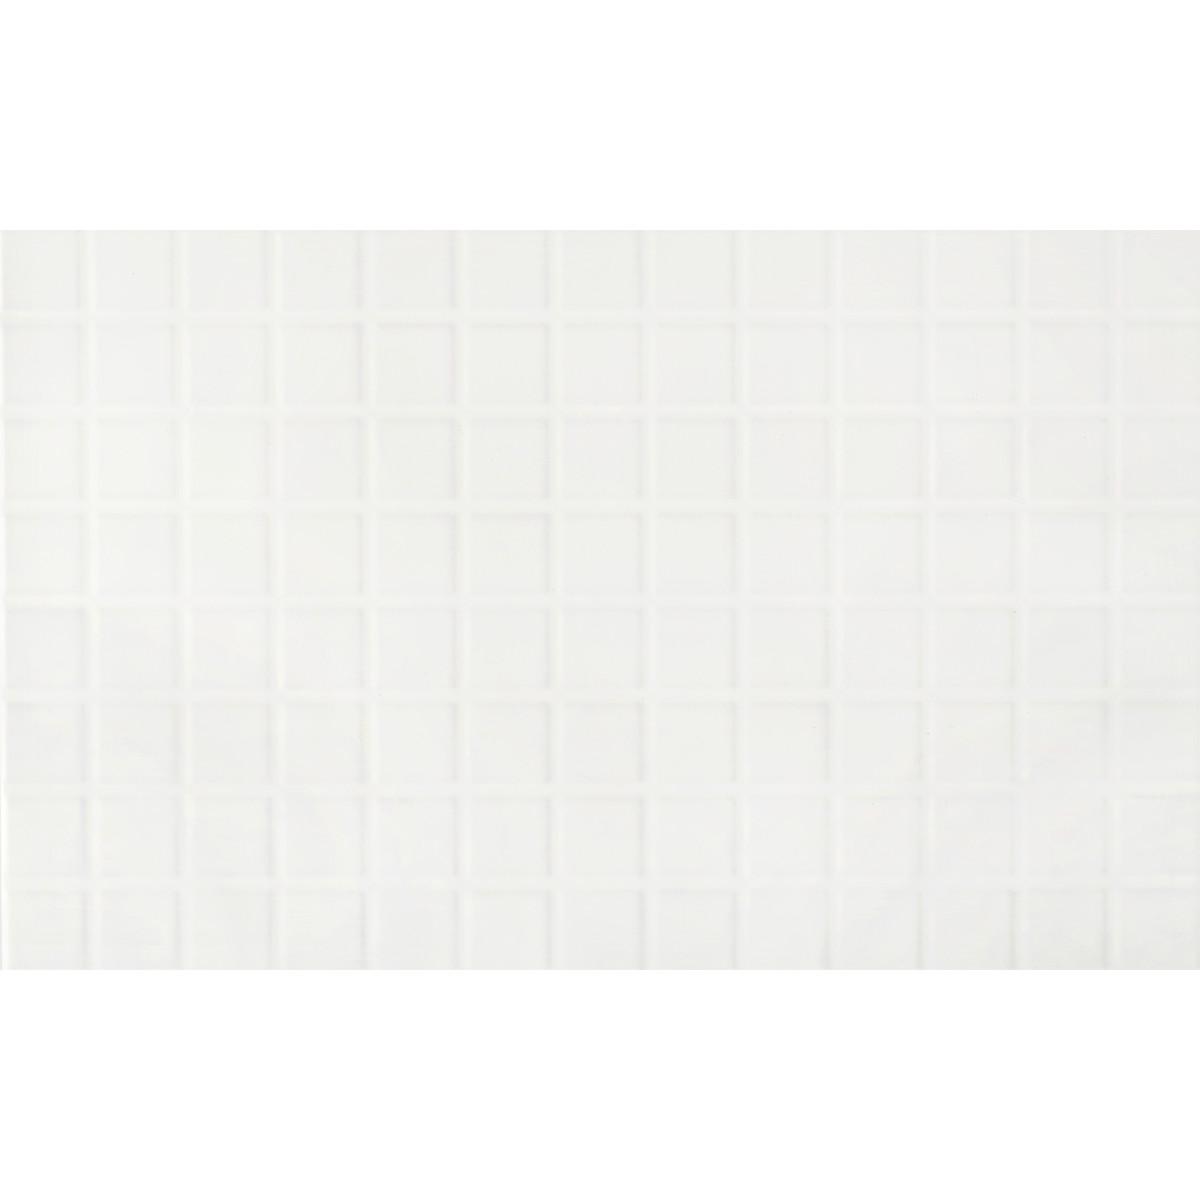 Плитка настенная Artens Арктика 3D 25х40 см 1.1 м² цвет белый матовый